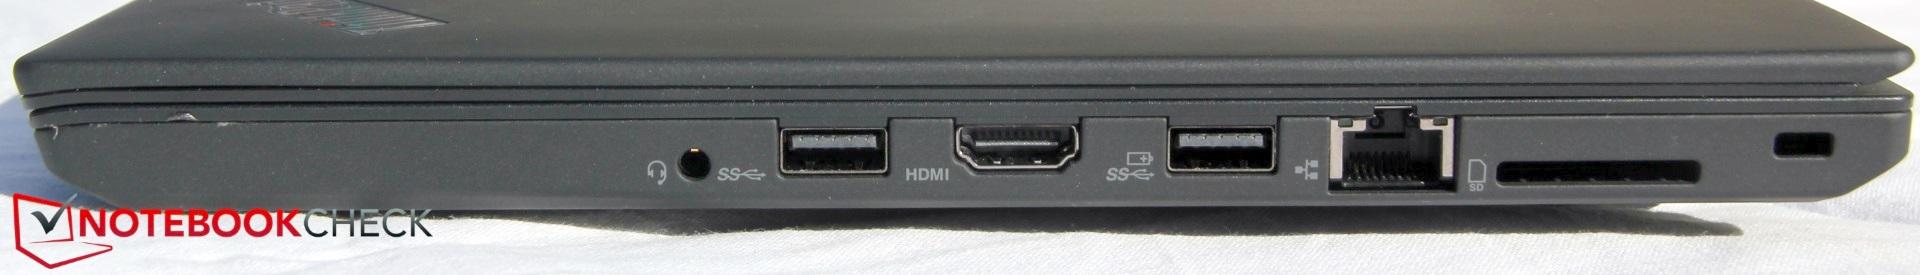 Test: Lenovo ThinkPad T480 (i7-8550U, MX150, FHD) Laptop